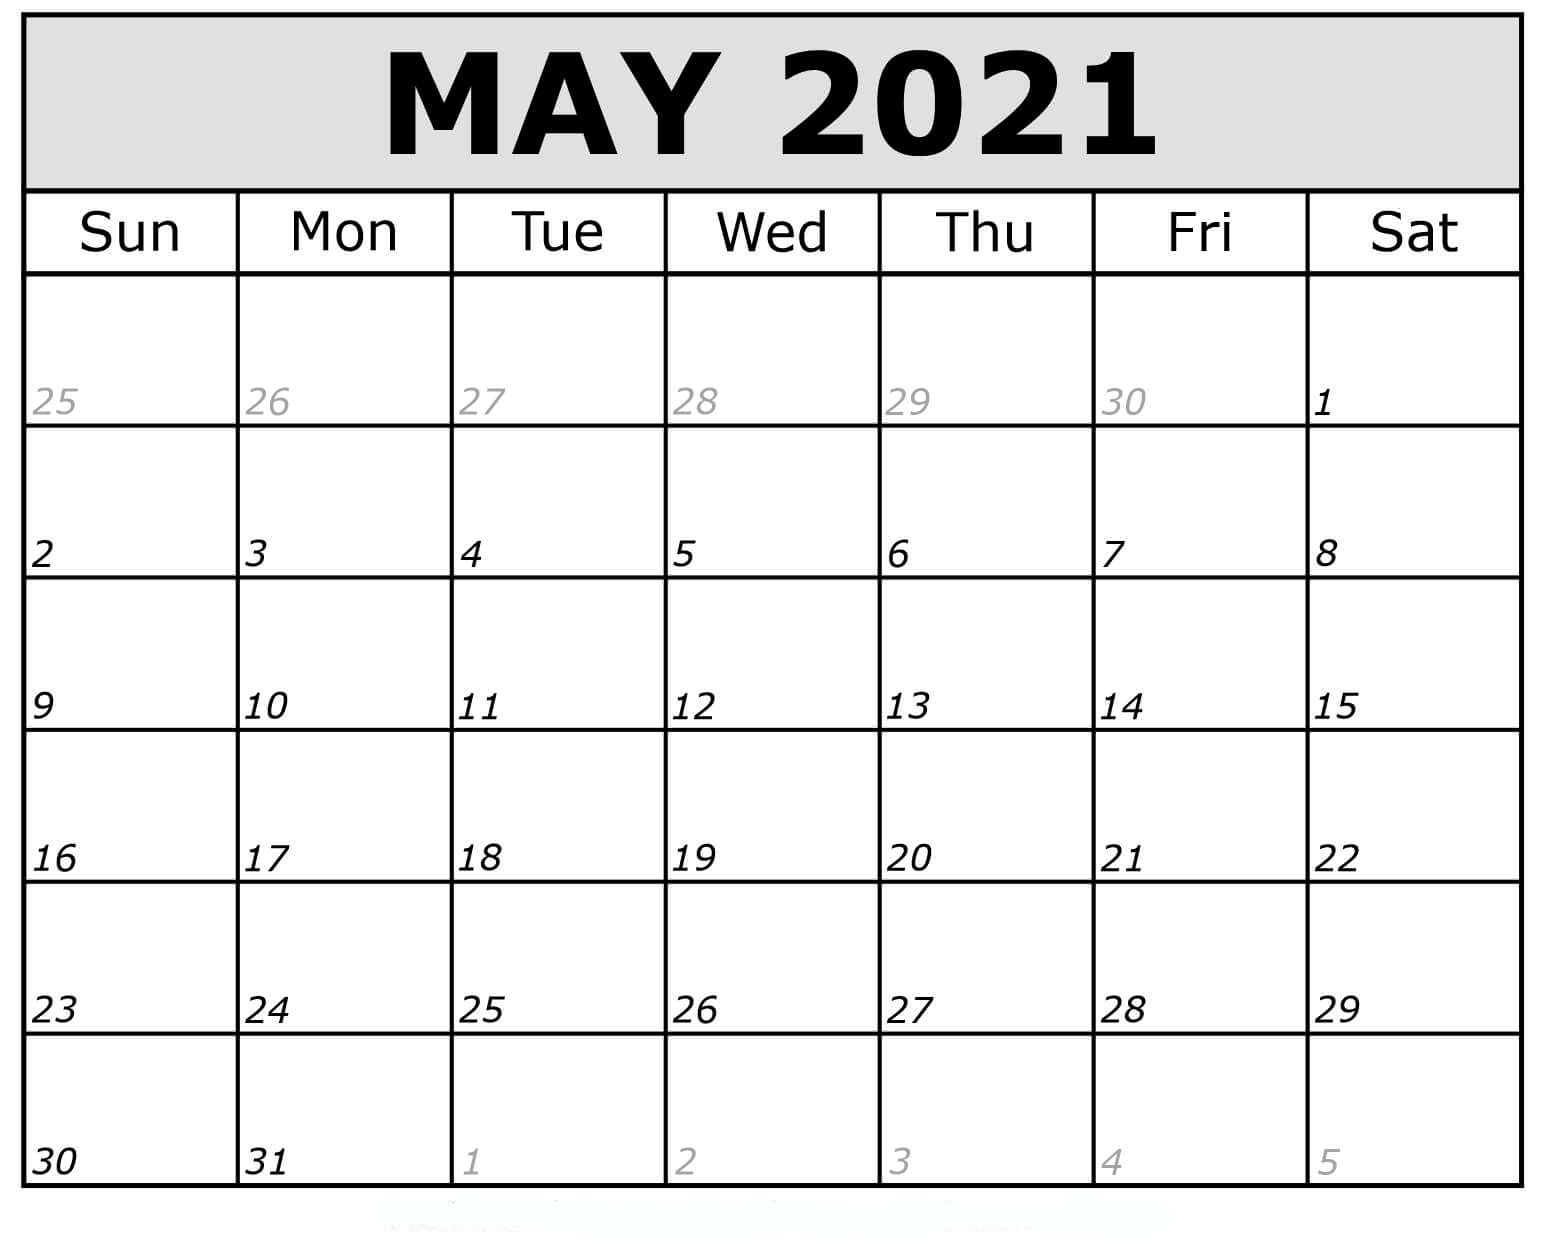 May 2021 Calendar Printable Pdf Mycalendarlabs